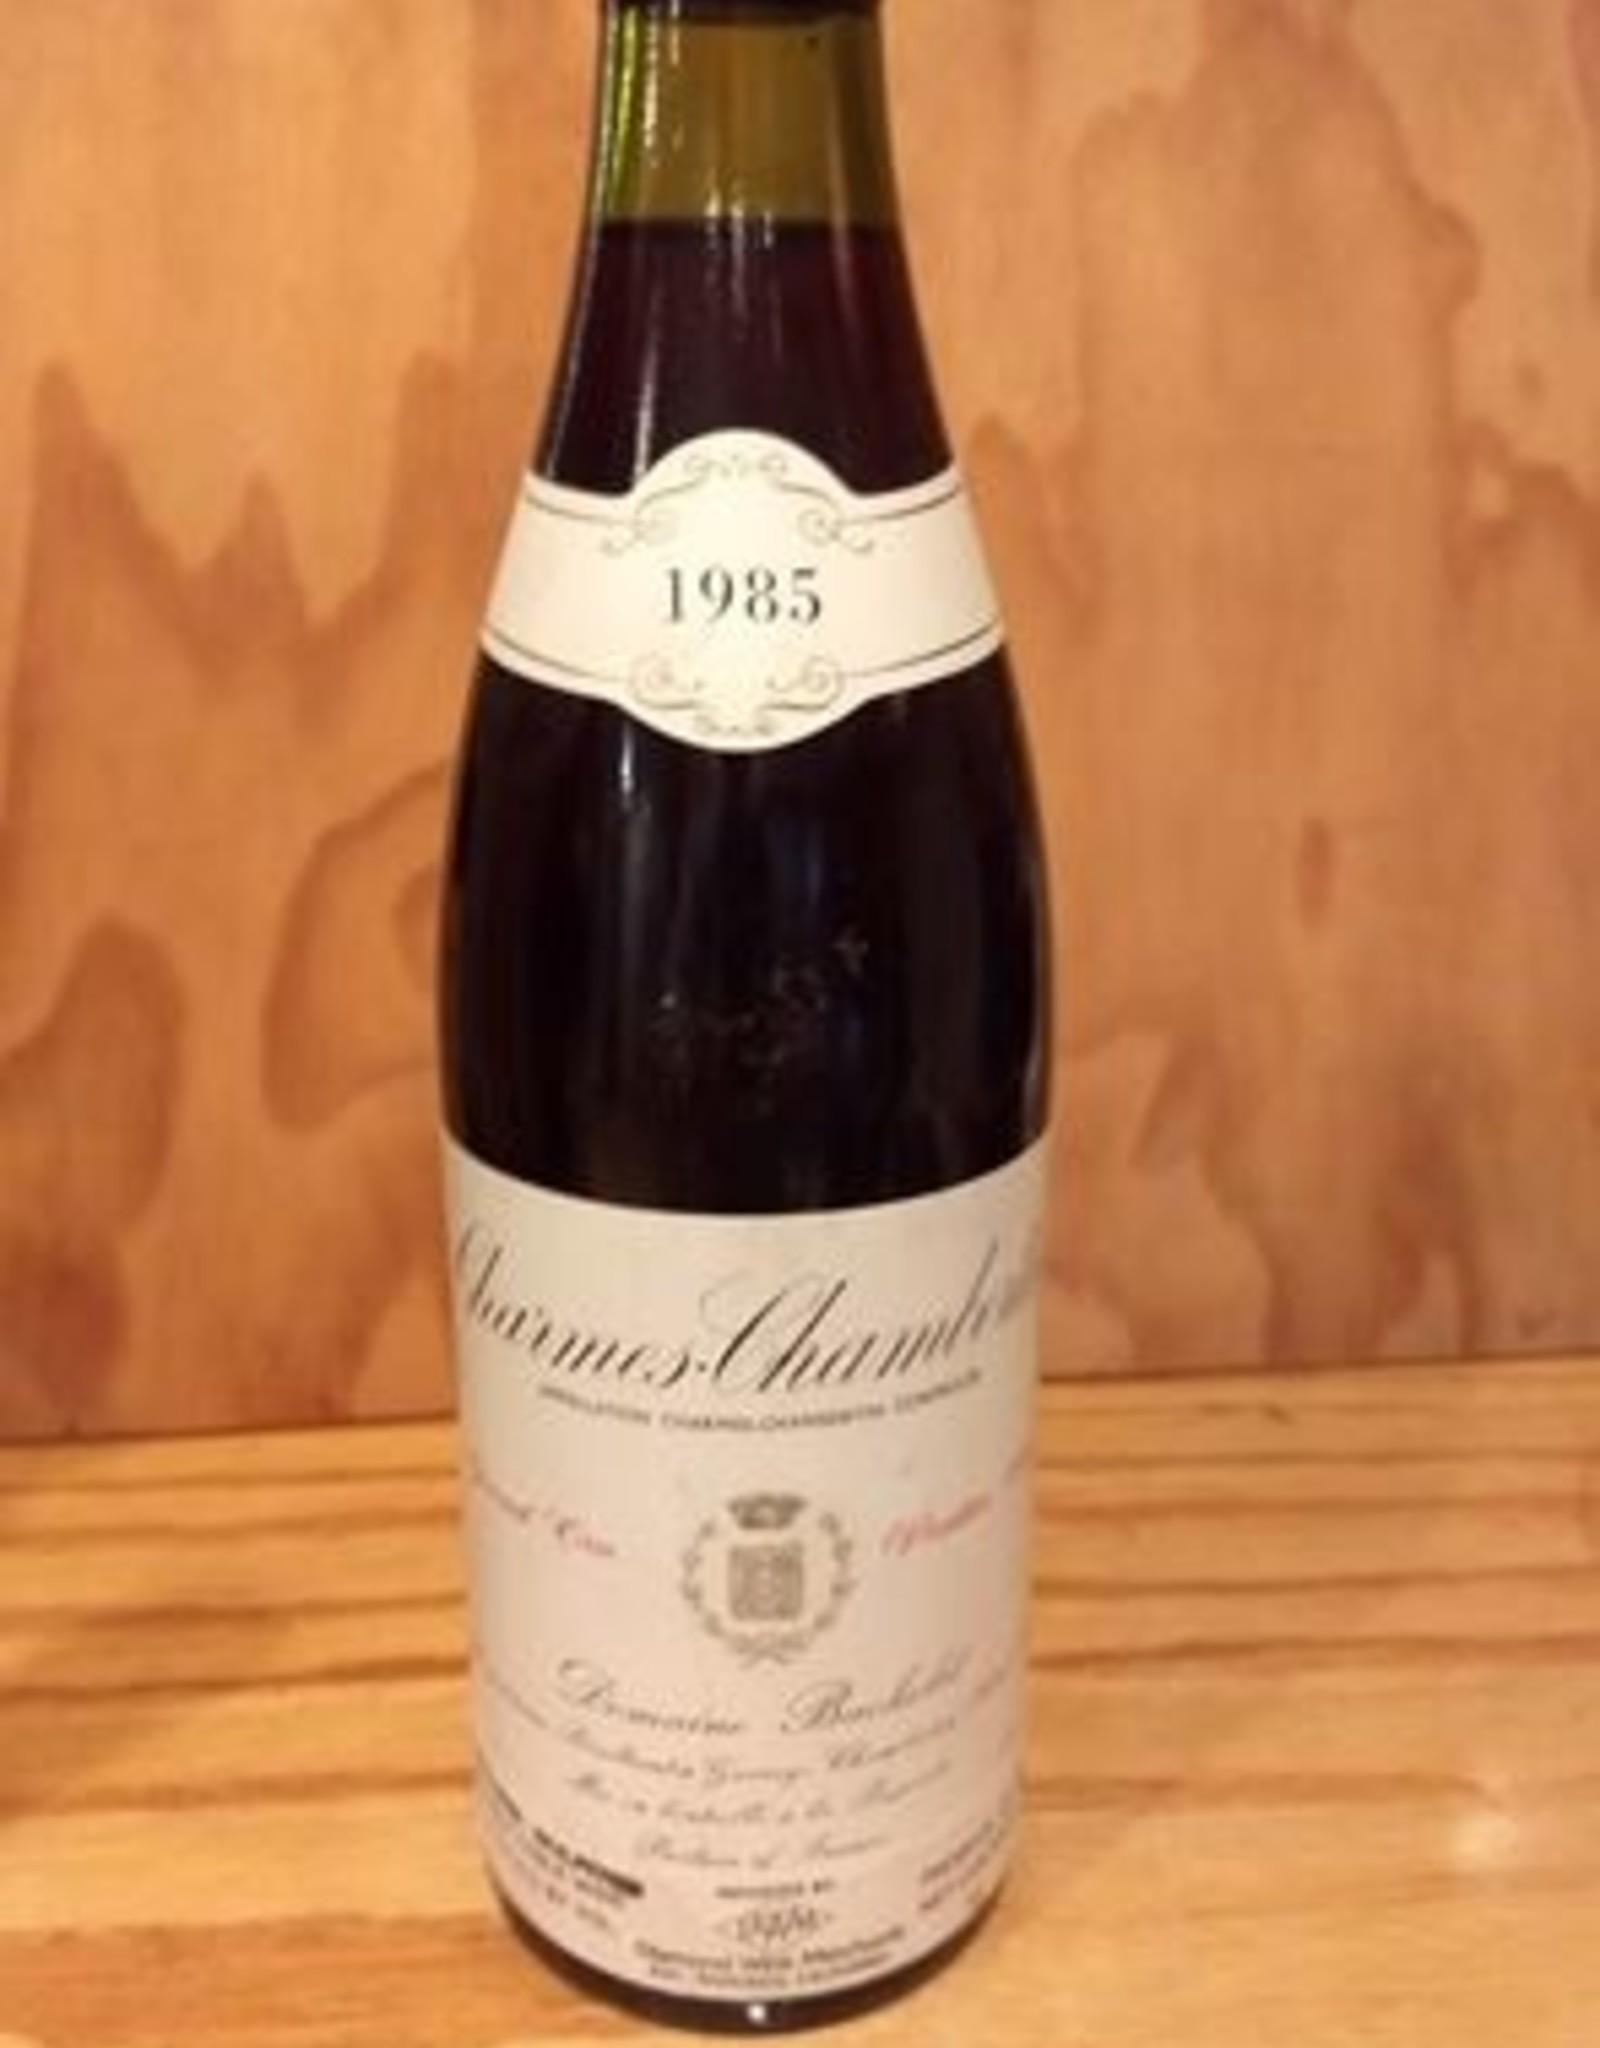 Bachelet Charmes Chambertin Vieilles Vignes 1985